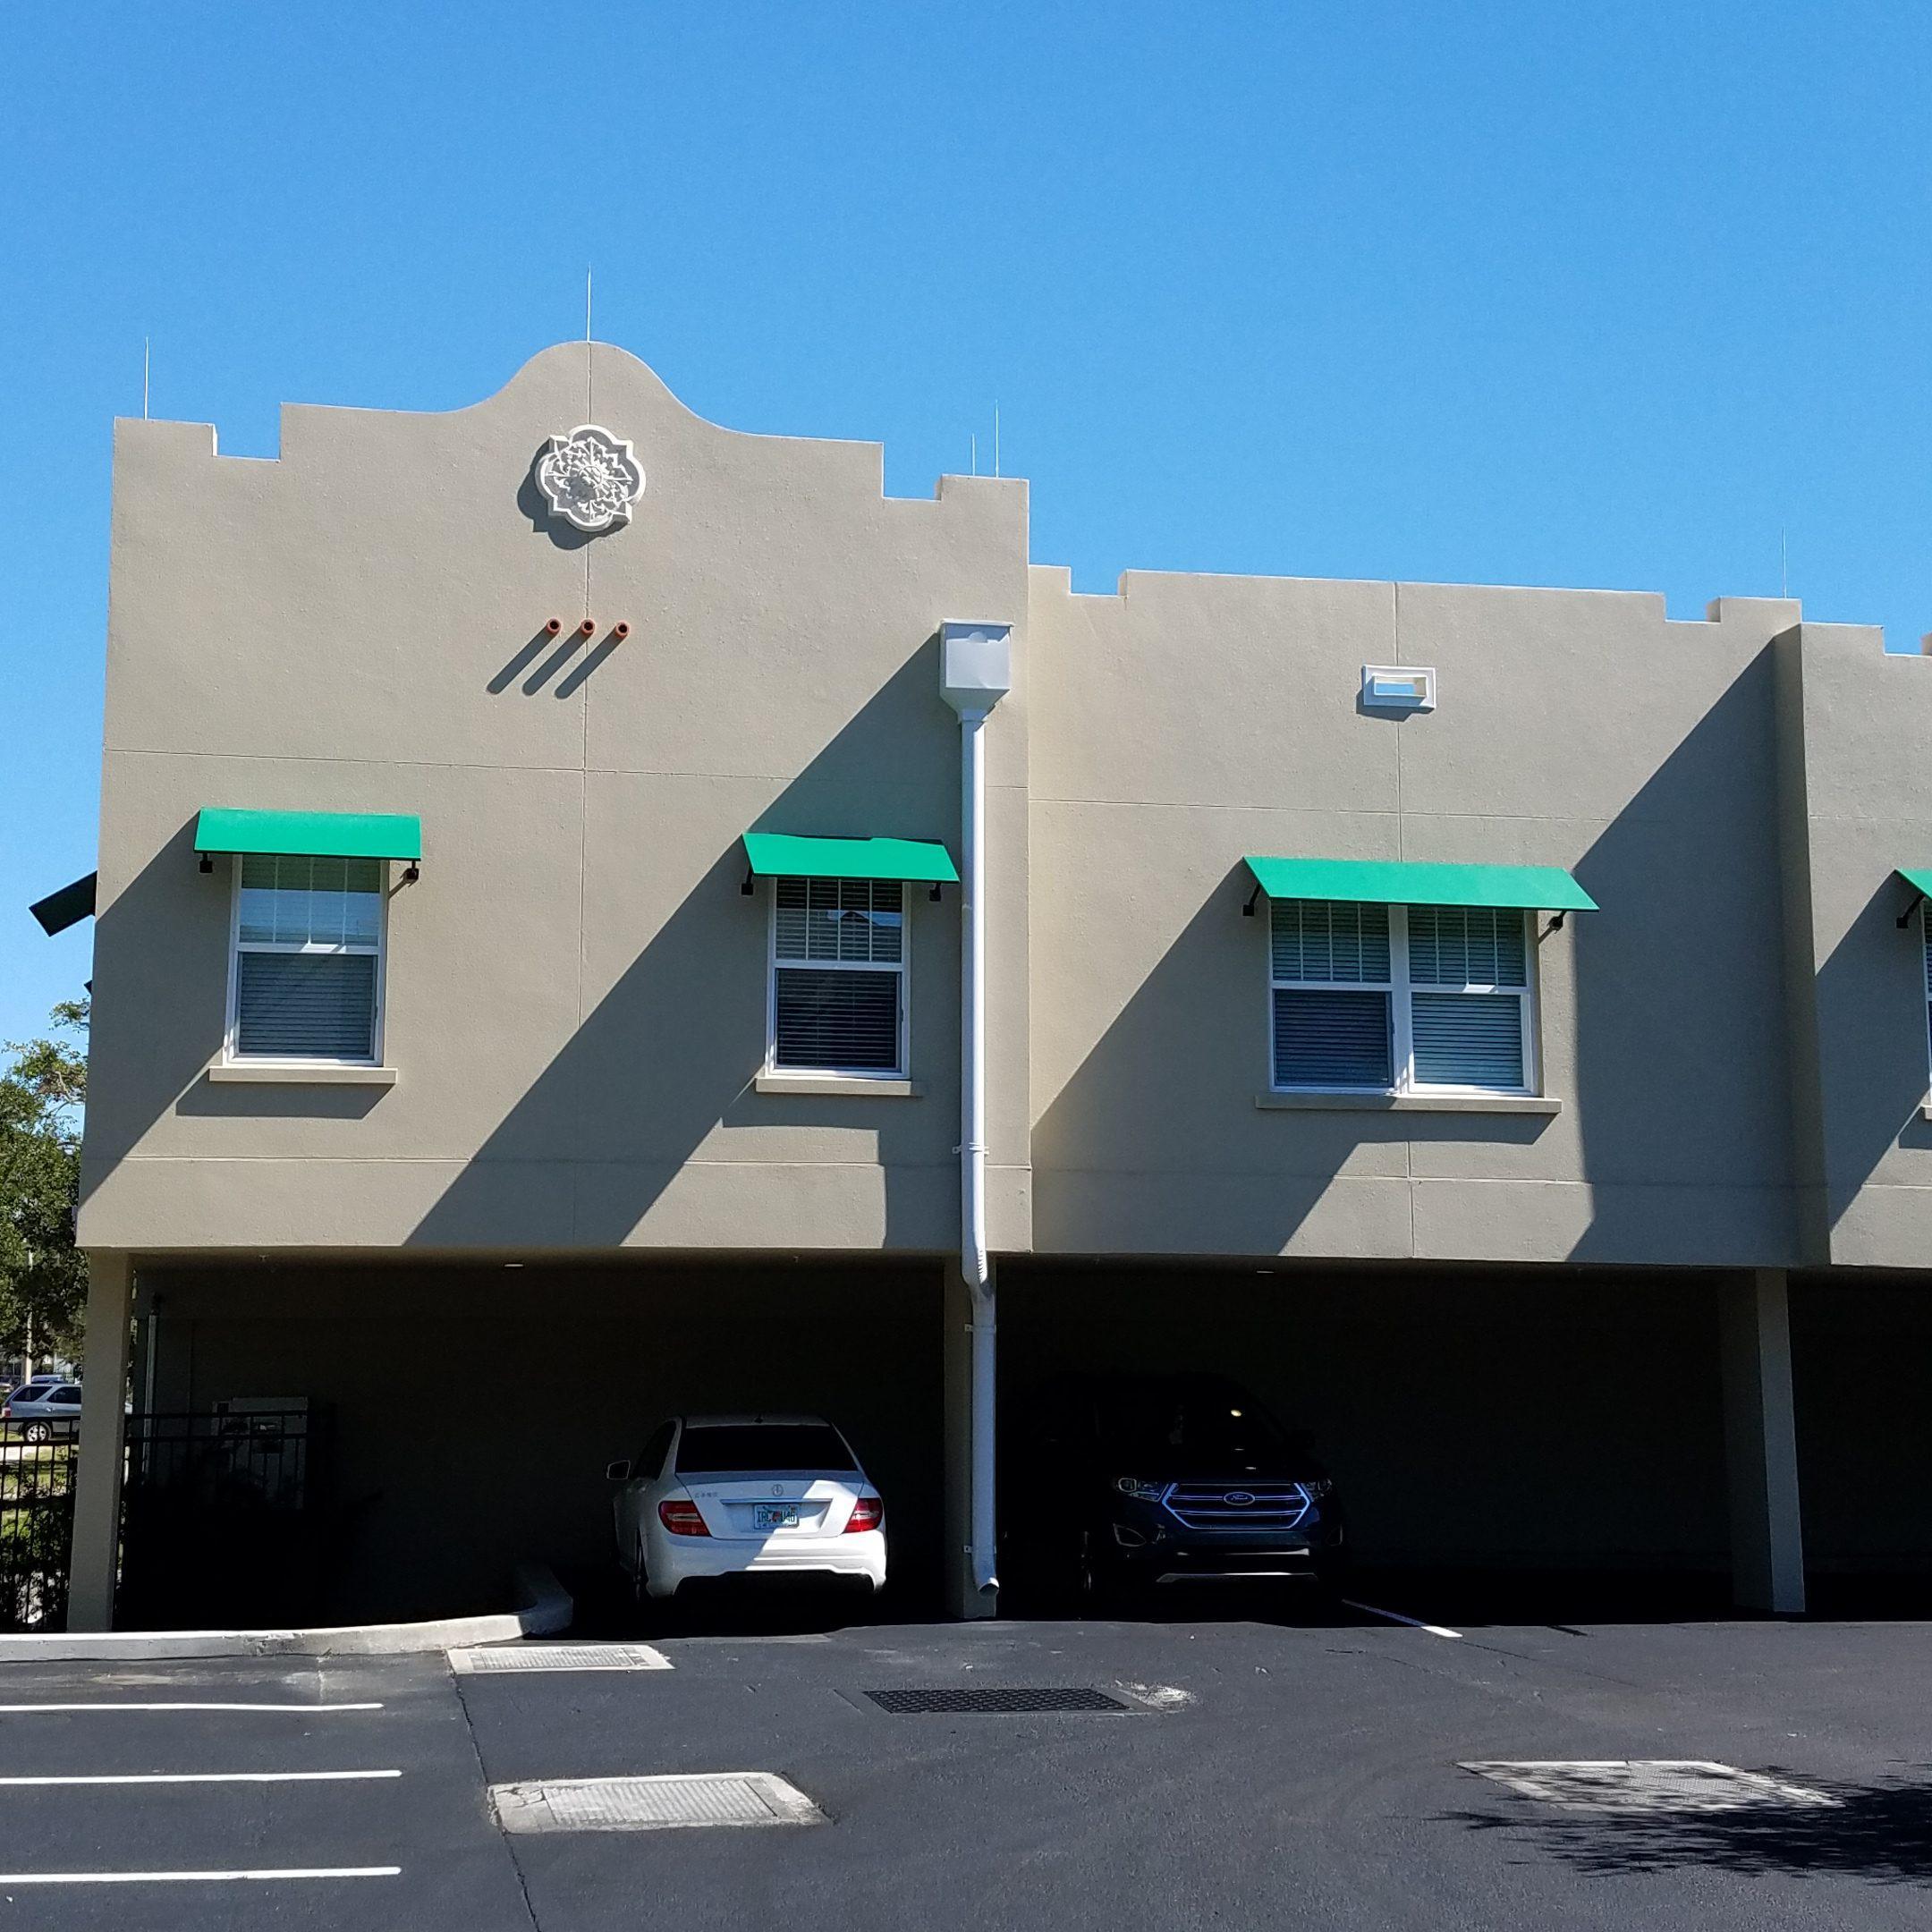 florida-housing-2-e1514911618240.jpg